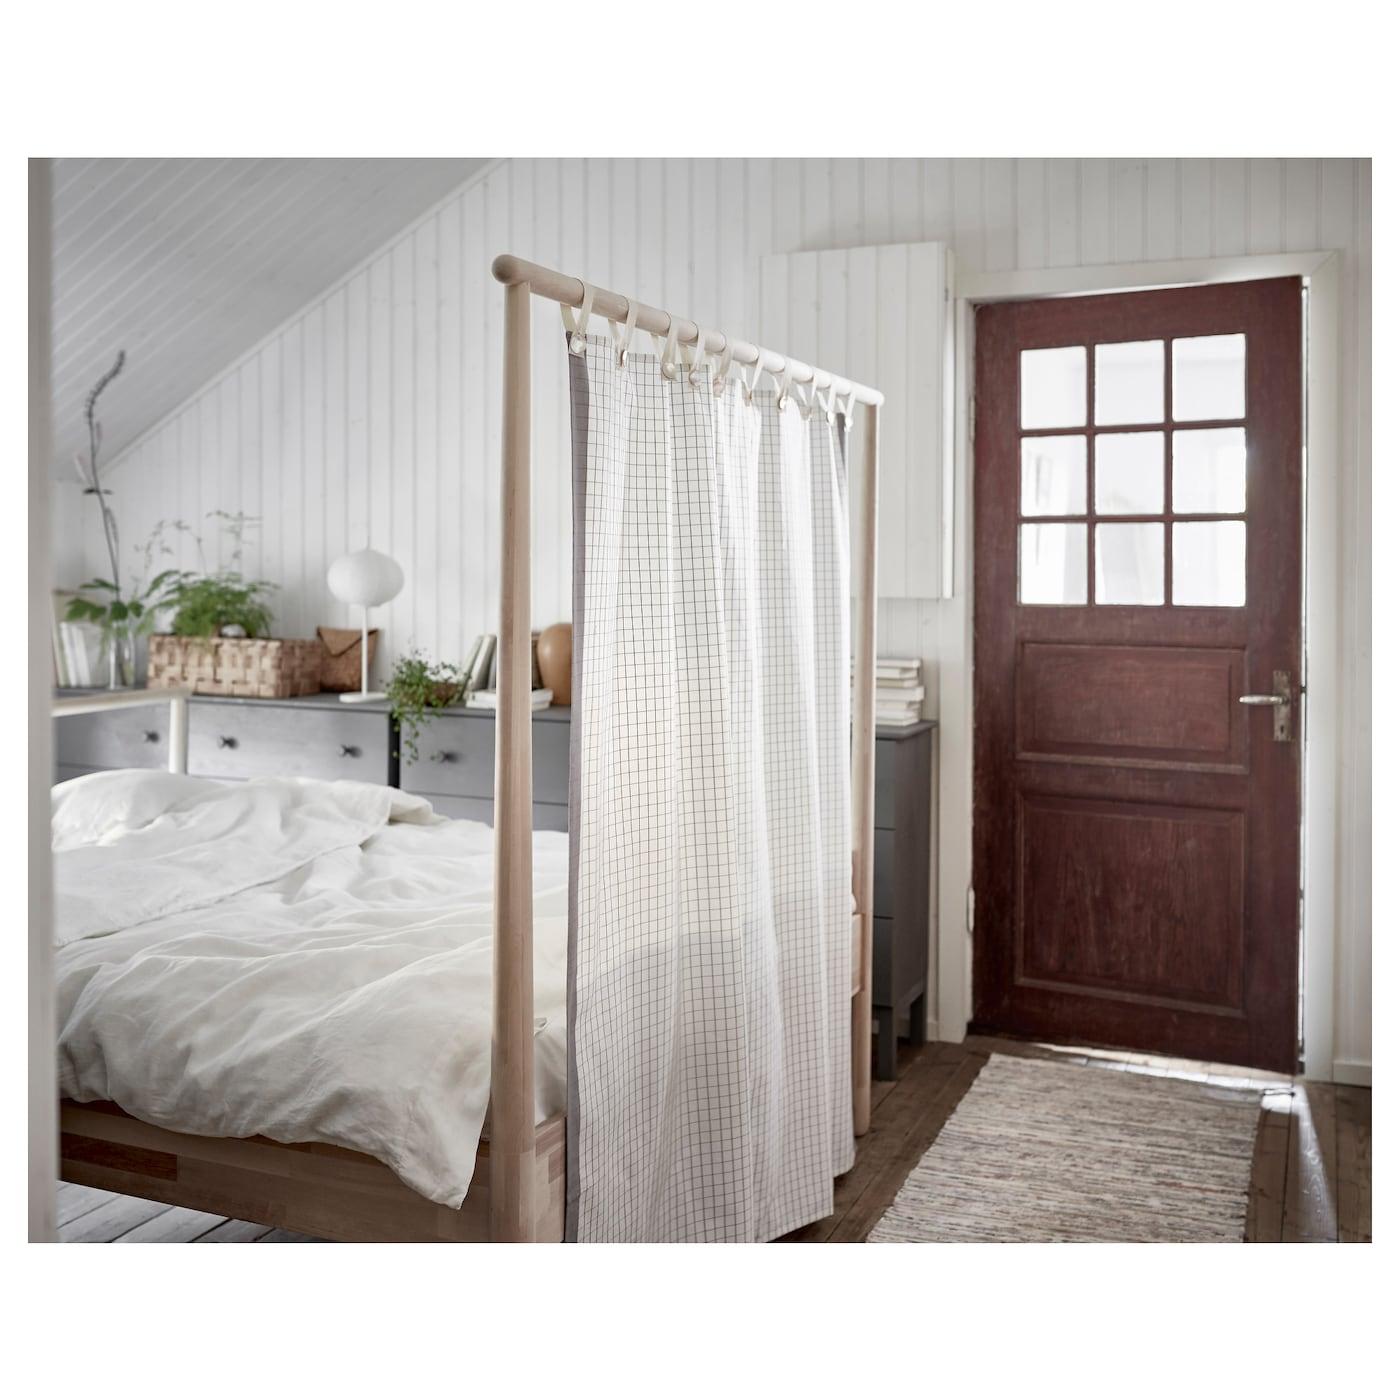 - GJÖRA Bed Frame - Birch, Leirsund - IKEA